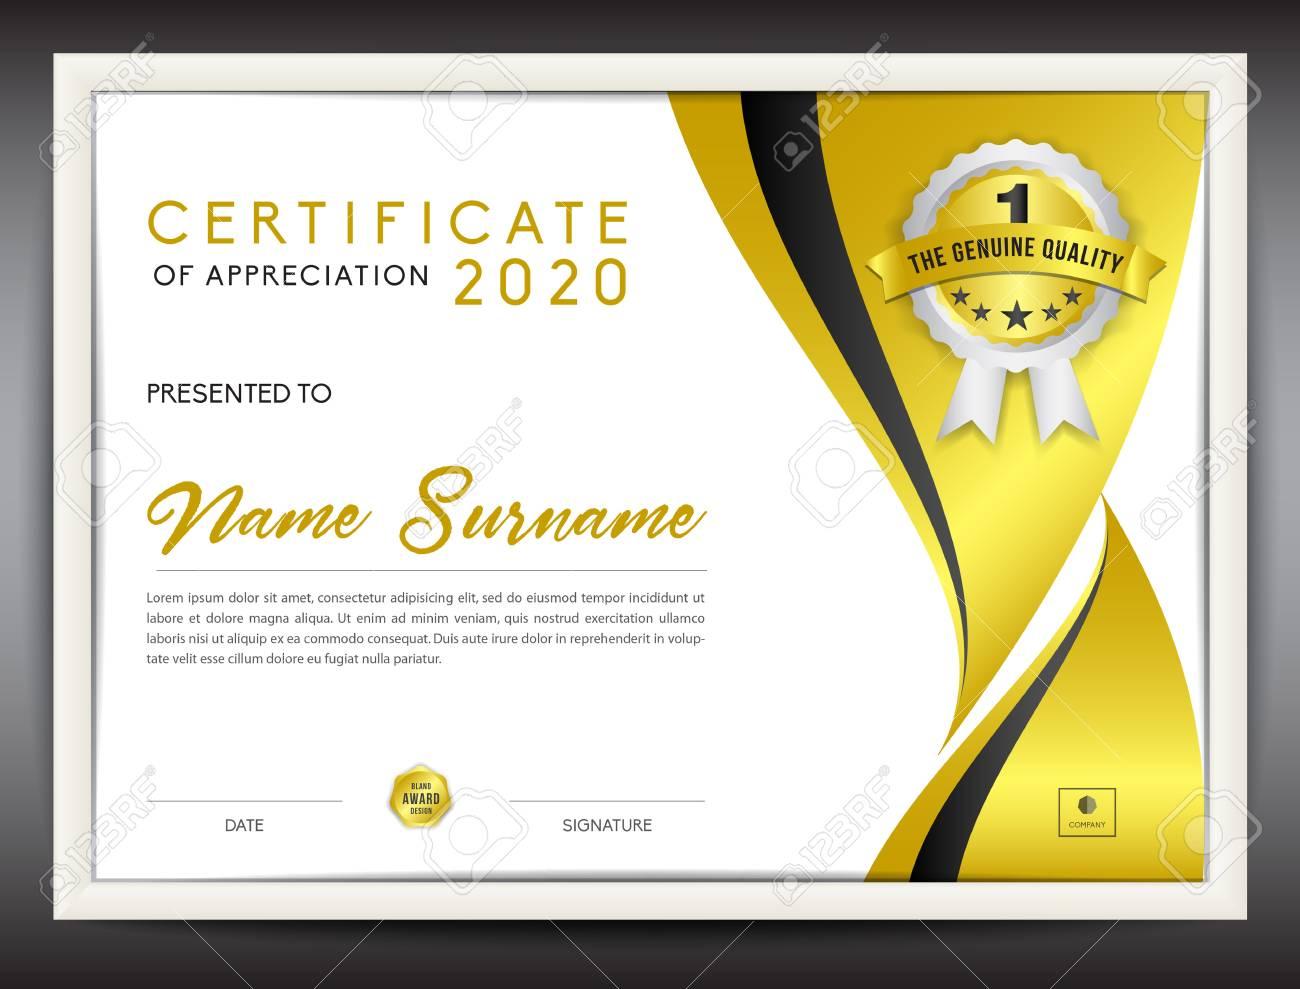 Certificate template vector illustration diploma layout in a4 certificate template vector illustration diploma layout in a4 size gold business flyer design yadclub Images